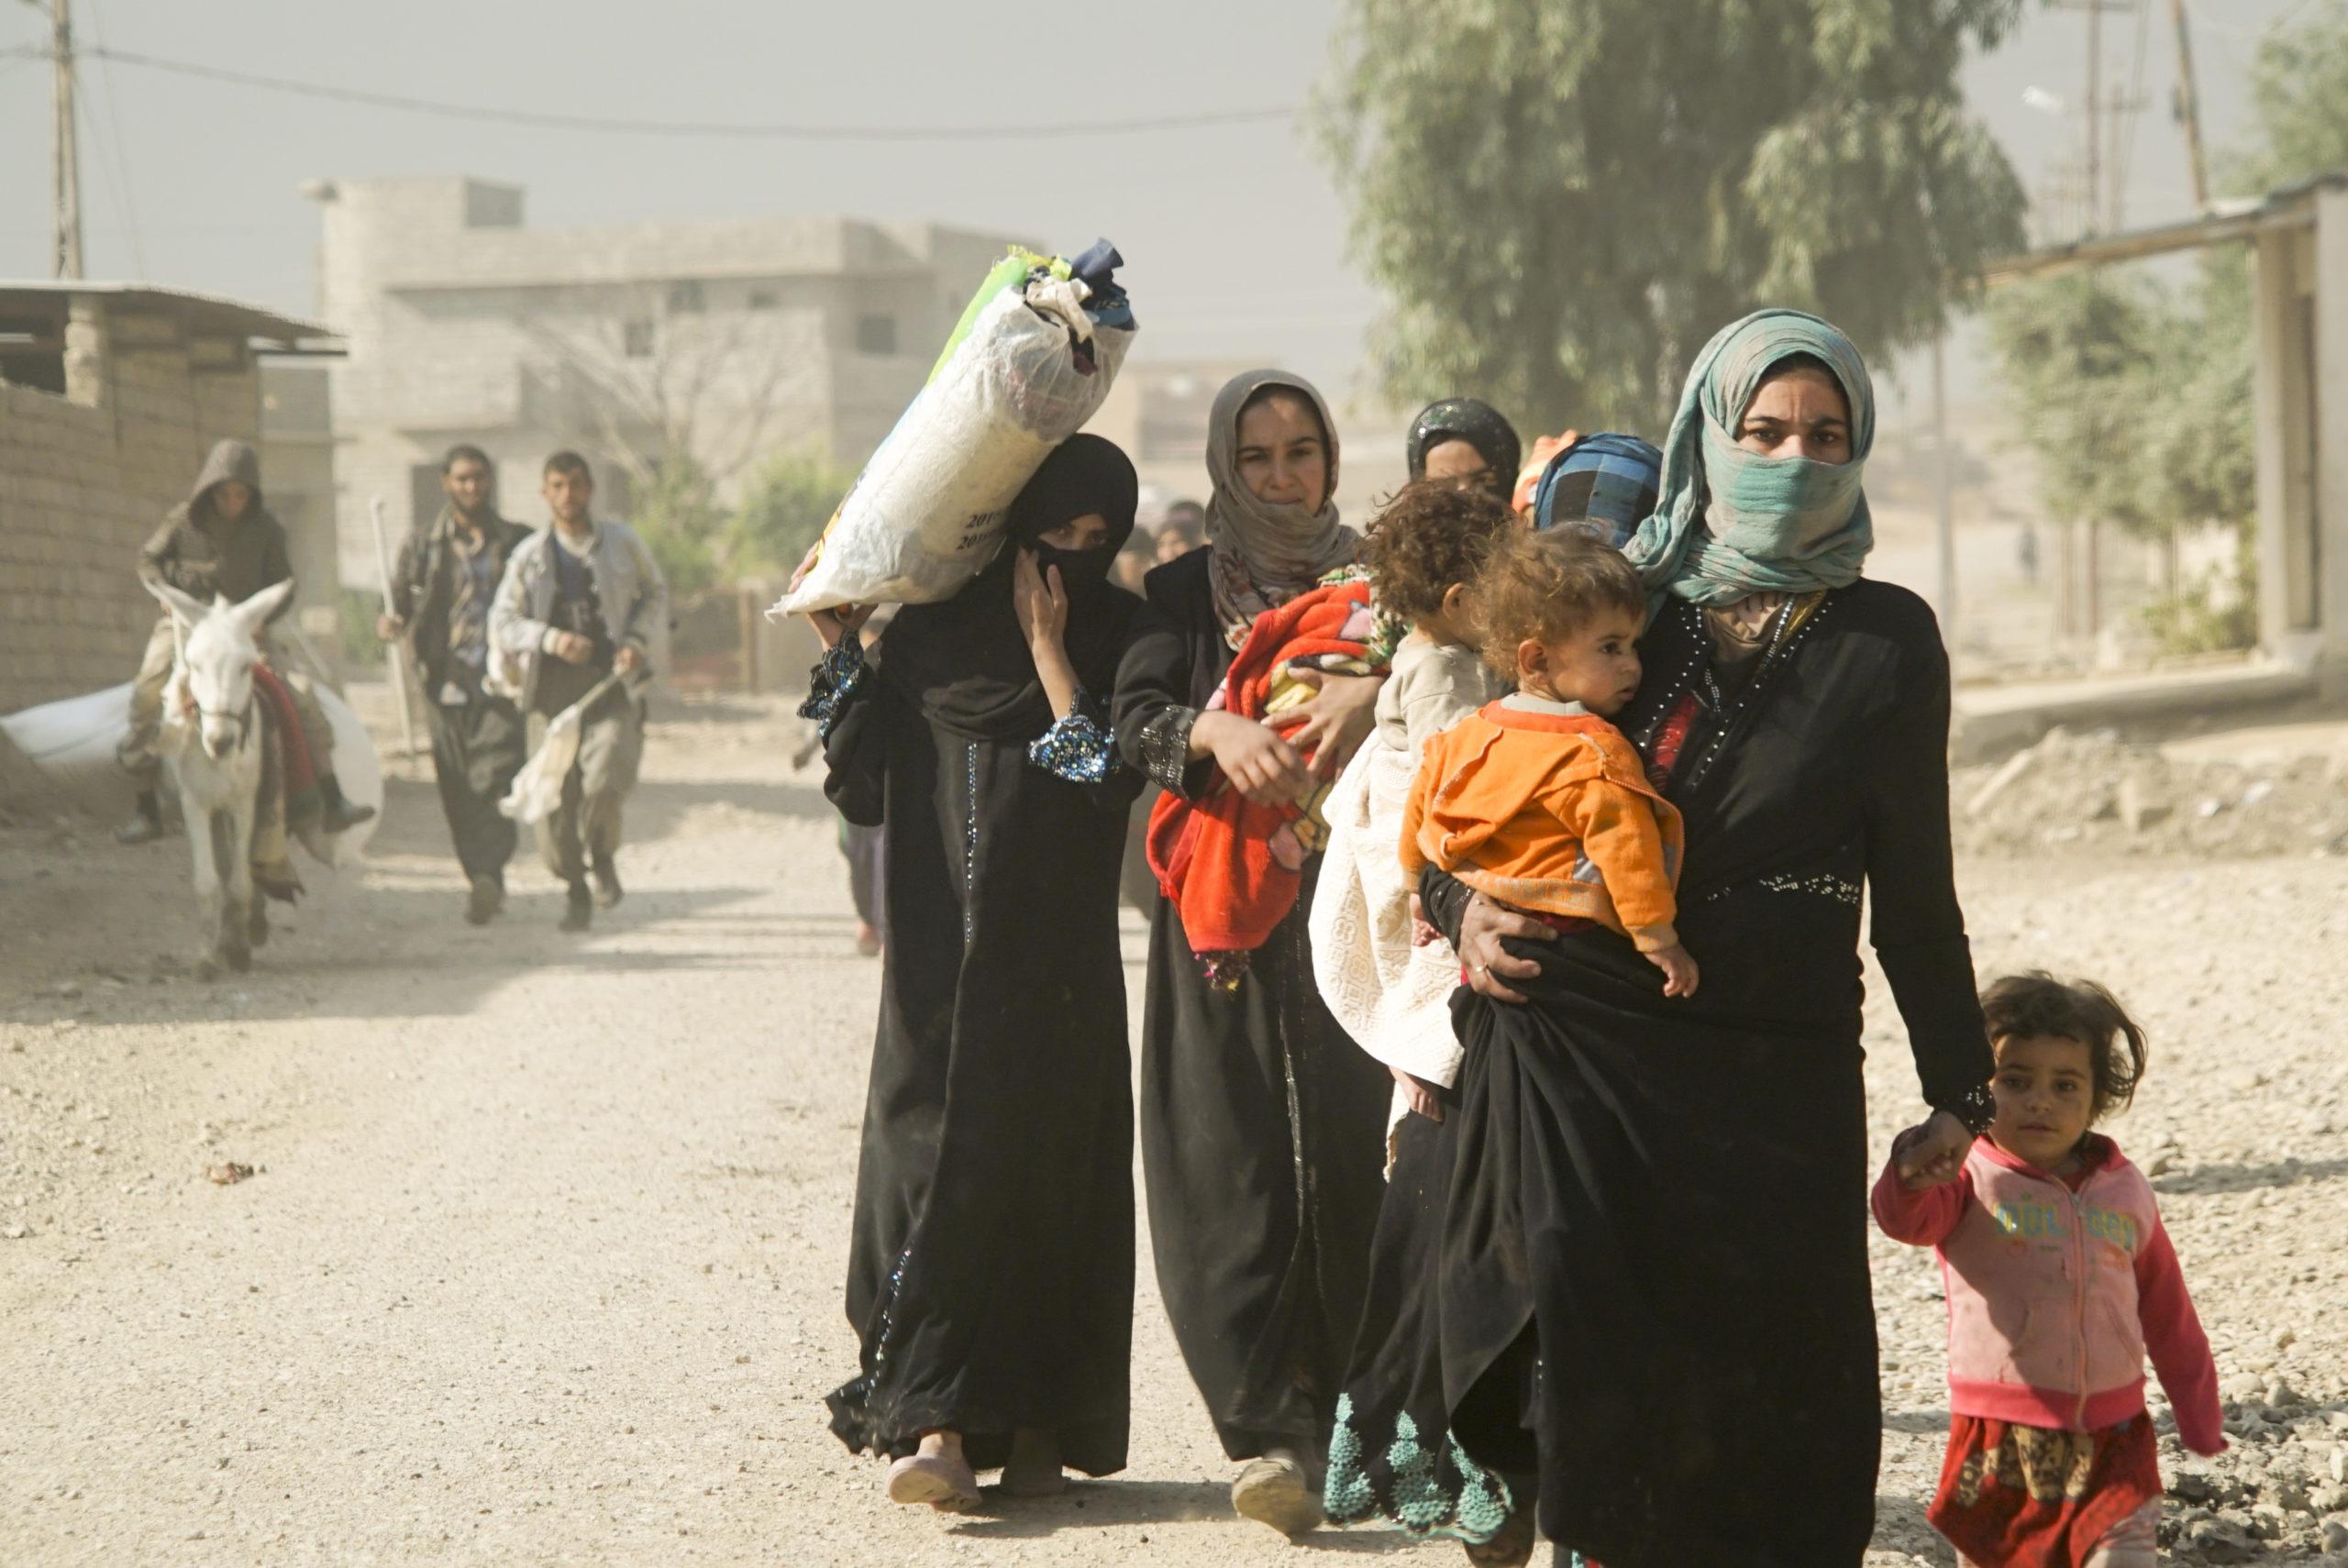 Réfugiés, Mossoul (Irak) @ wikimedia commons / Mstyslav Chernov